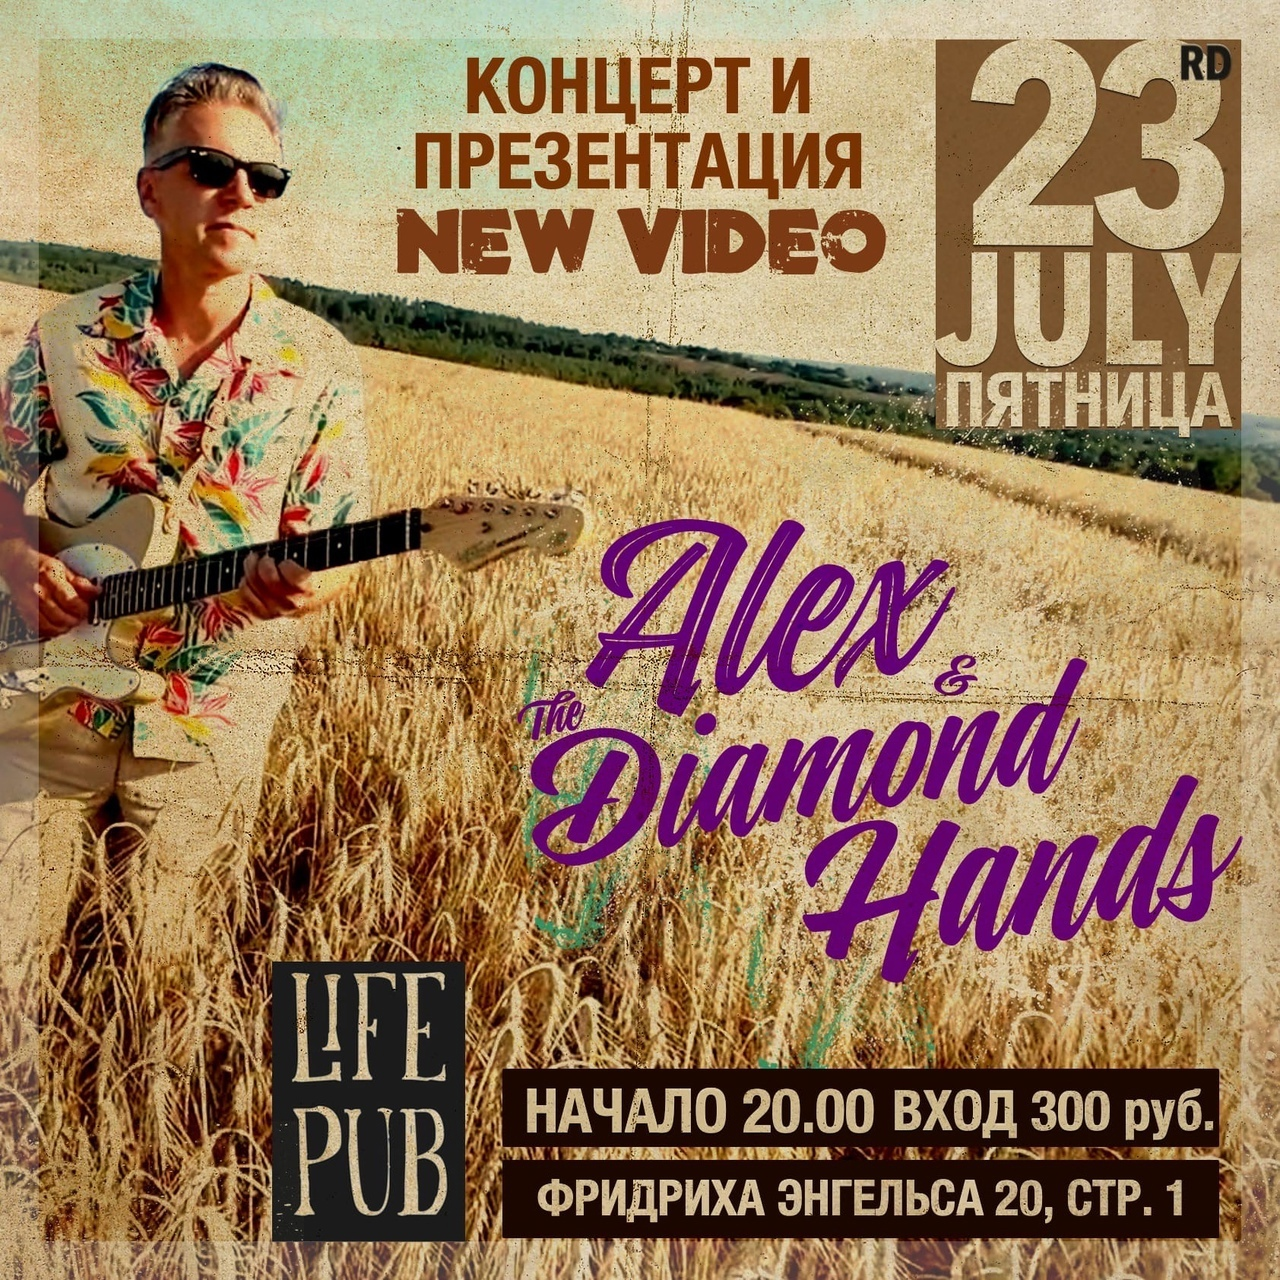 23.07 Alex & The Diamond Hands в Life Pub!